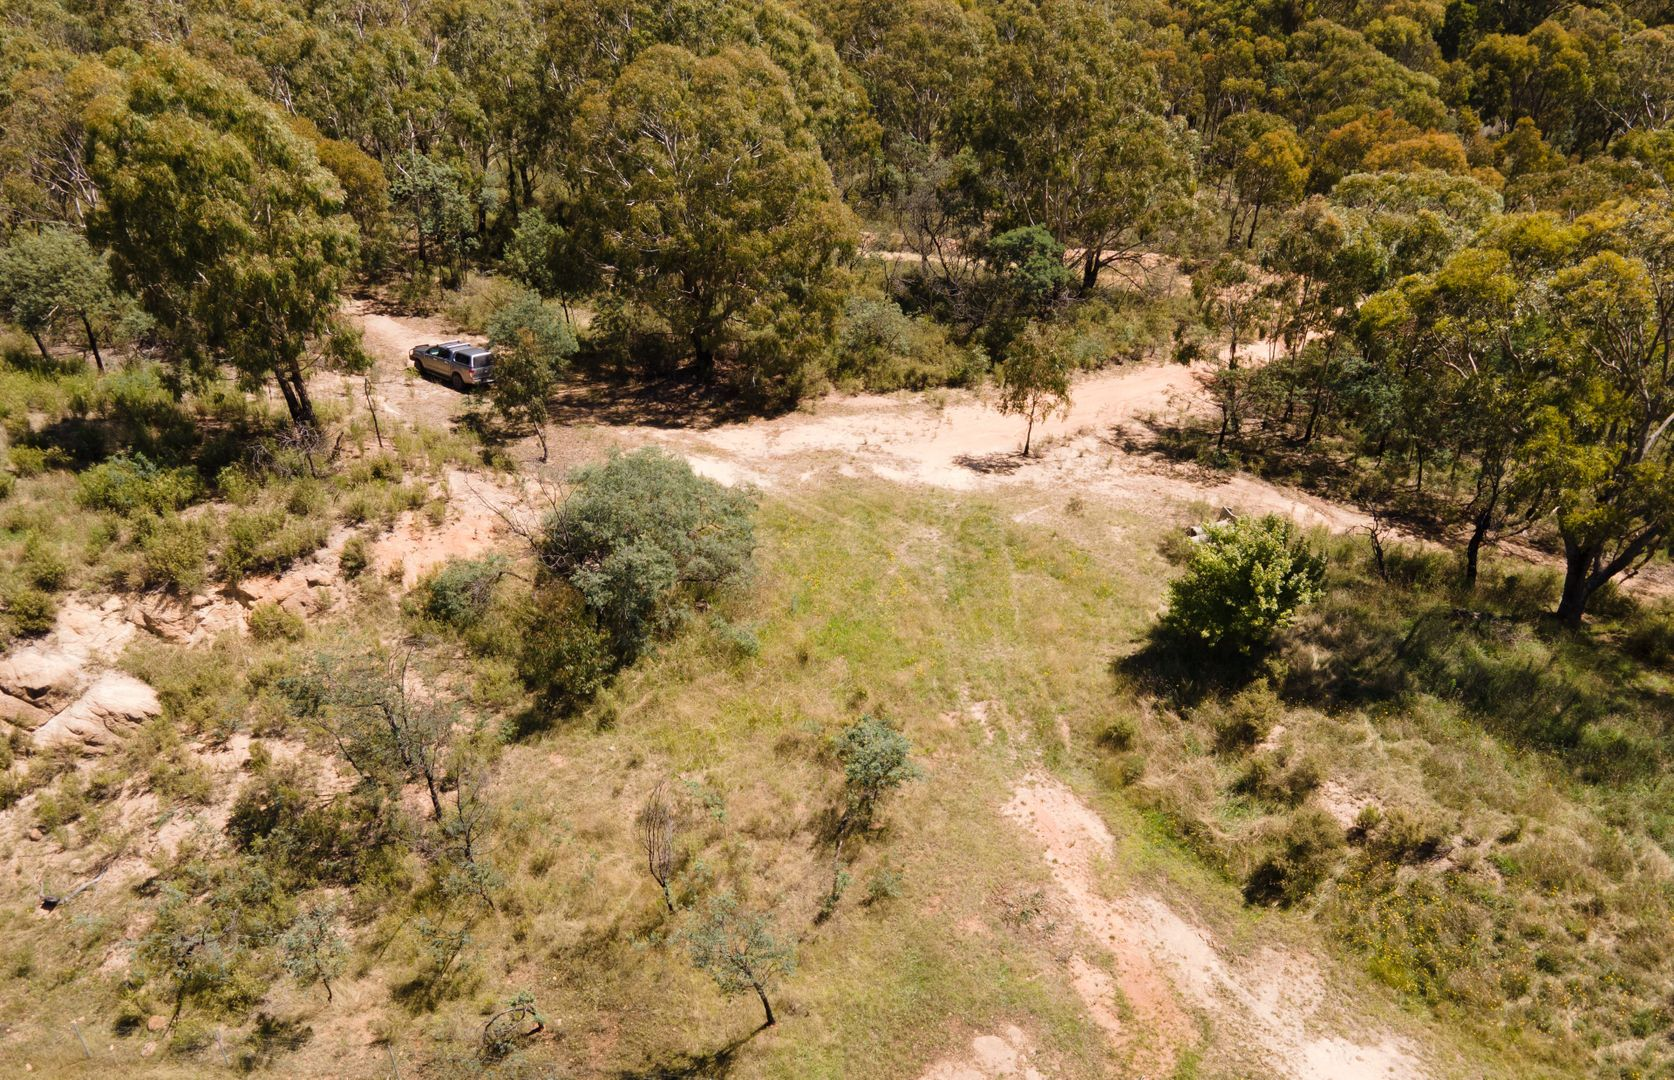 960 Hazelgrove Road Hazelgrove, Oberon NSW 2787, Image 0